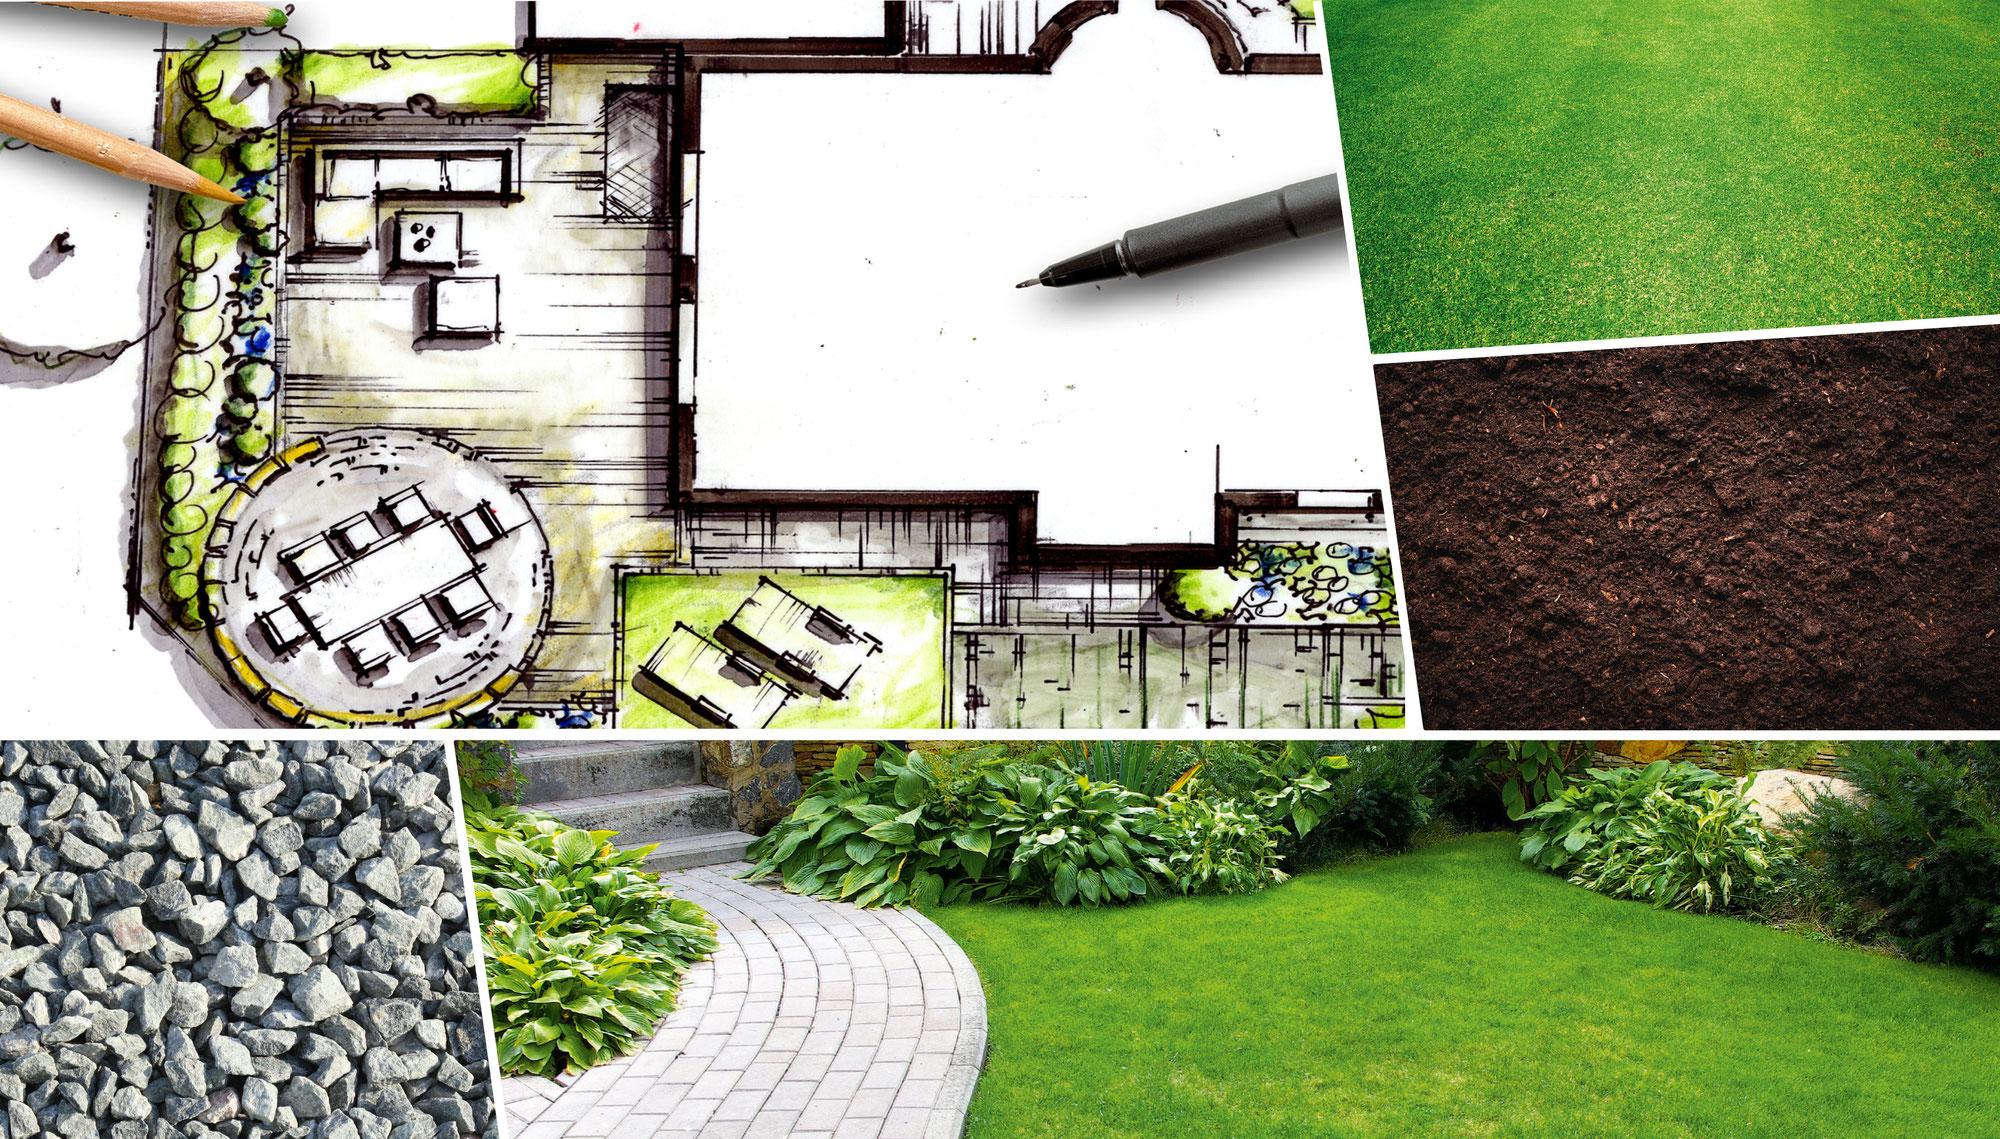 Impressum kirchhoff gartengestaltung garten landschaftsbau hanau - Garten und landschaftsbau hanau ...